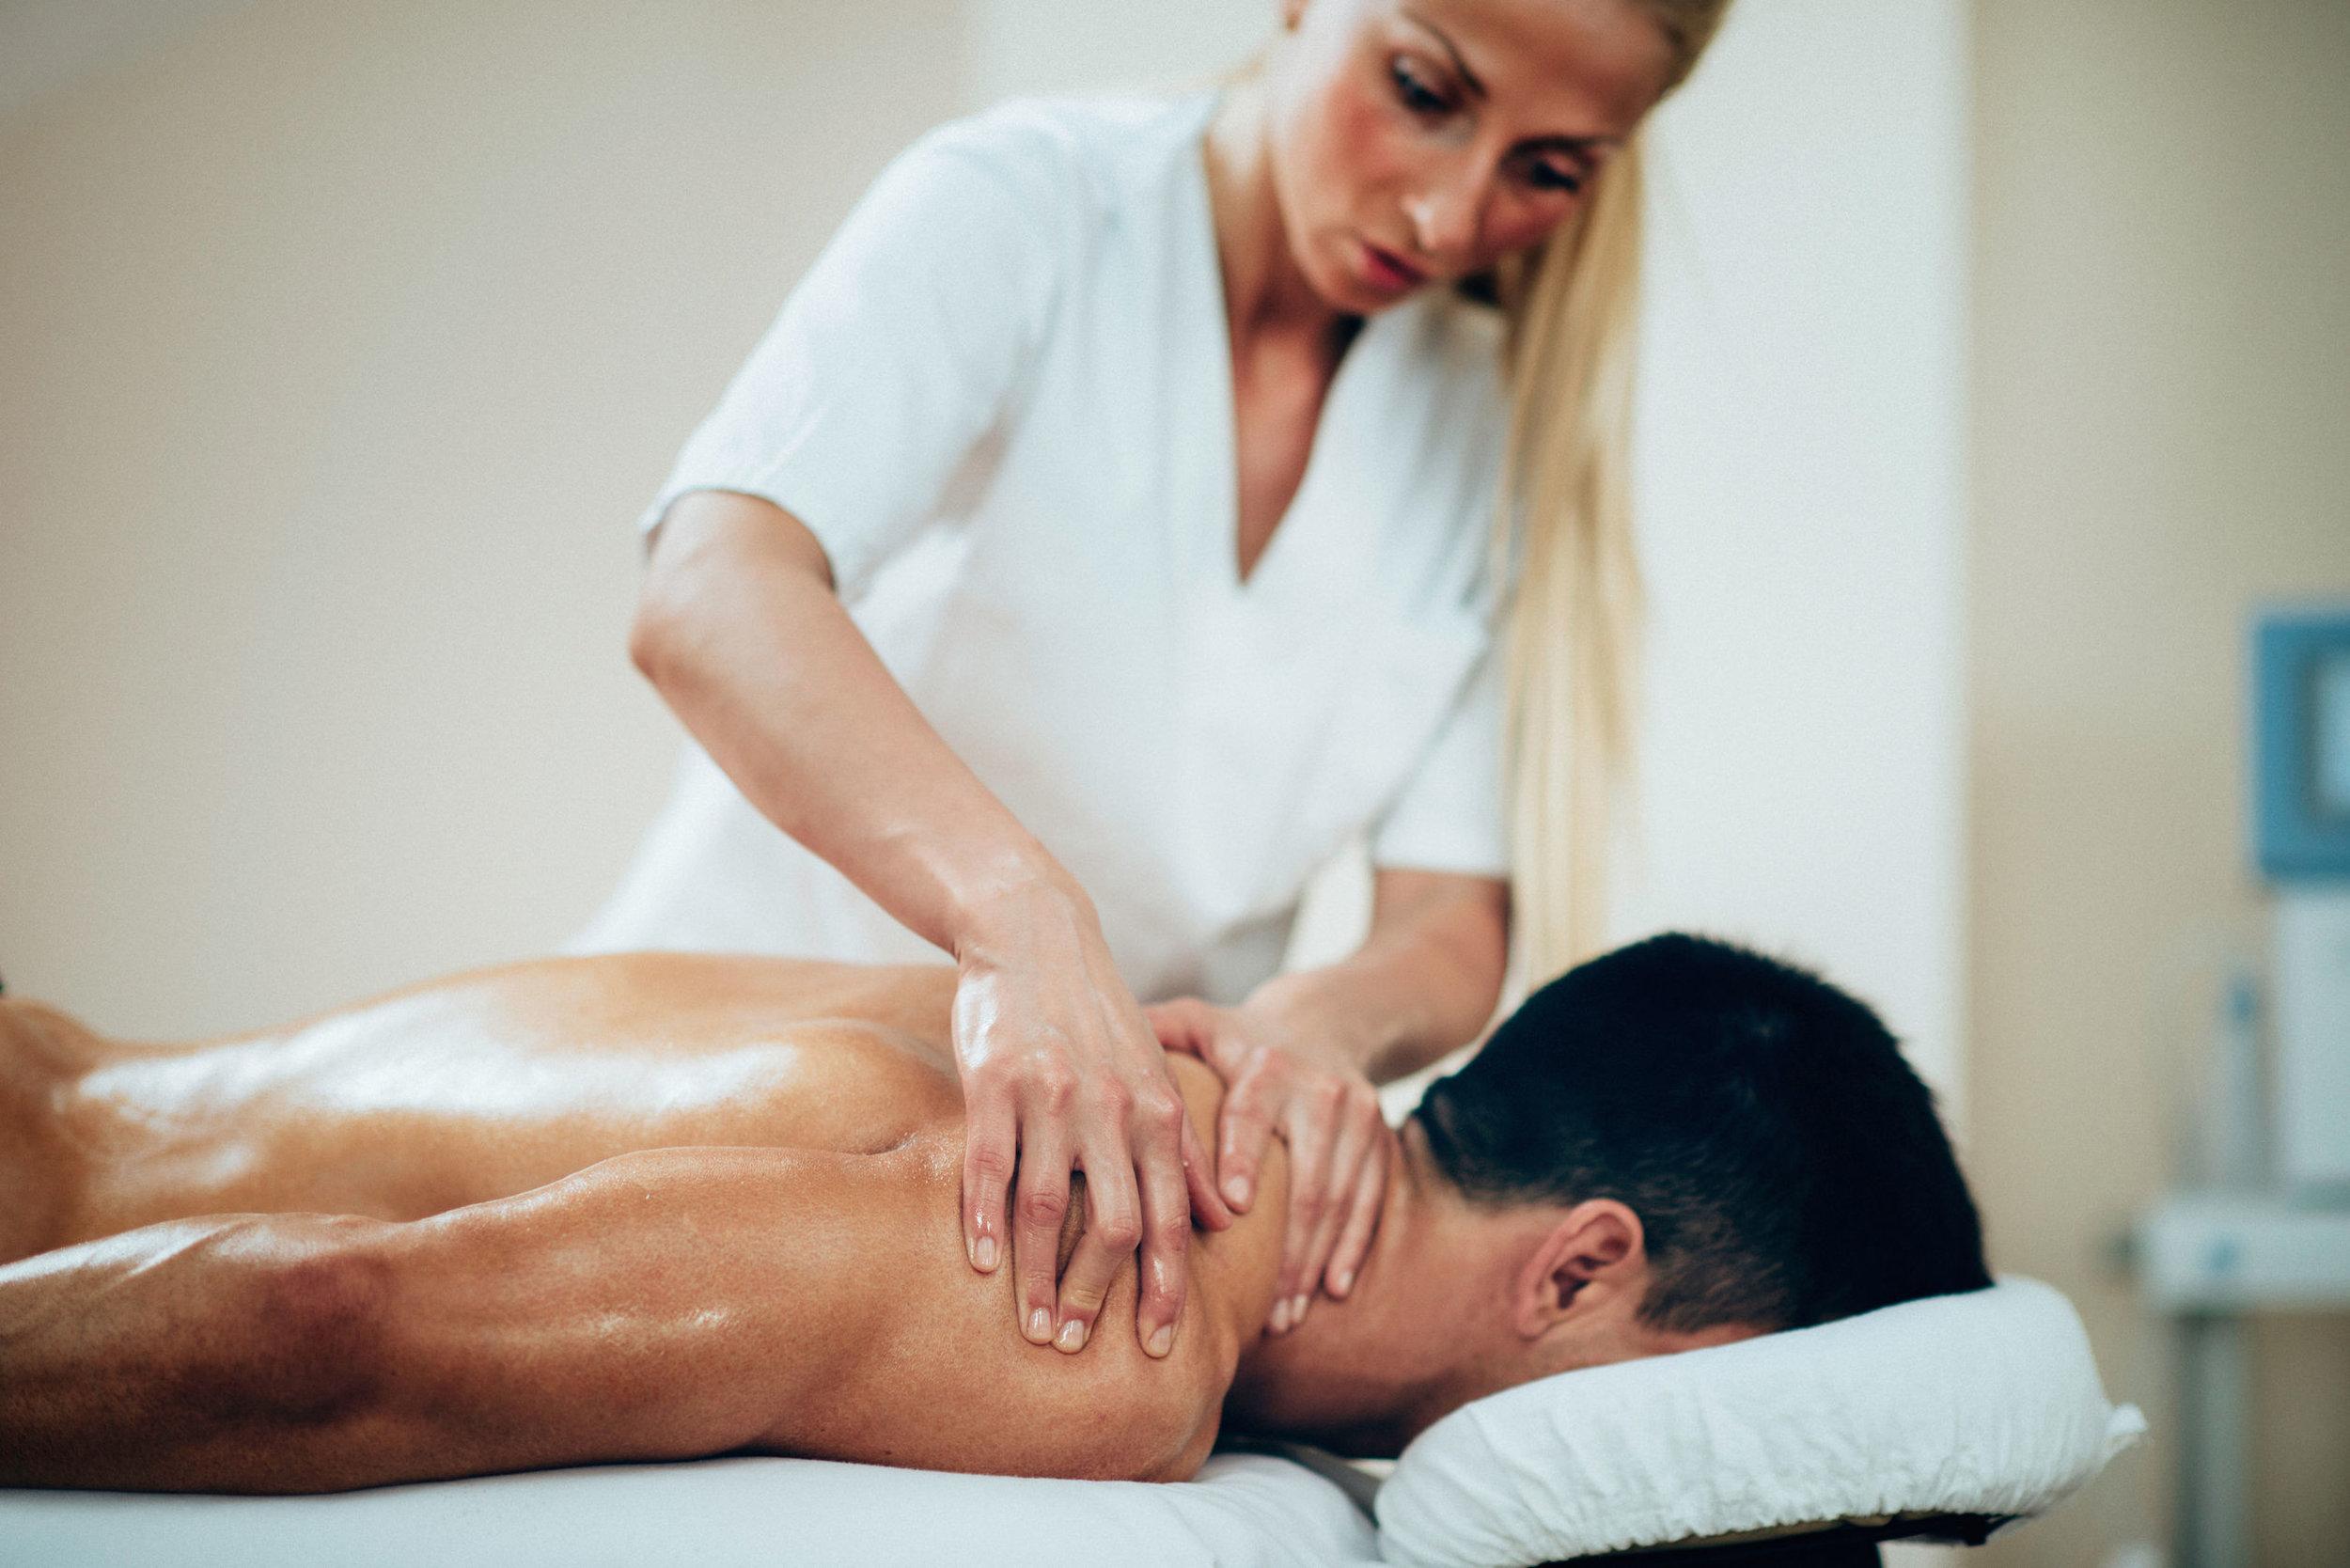 Therapeutische Berufe - Berufsmasseurin Reflexzonentherapeutin